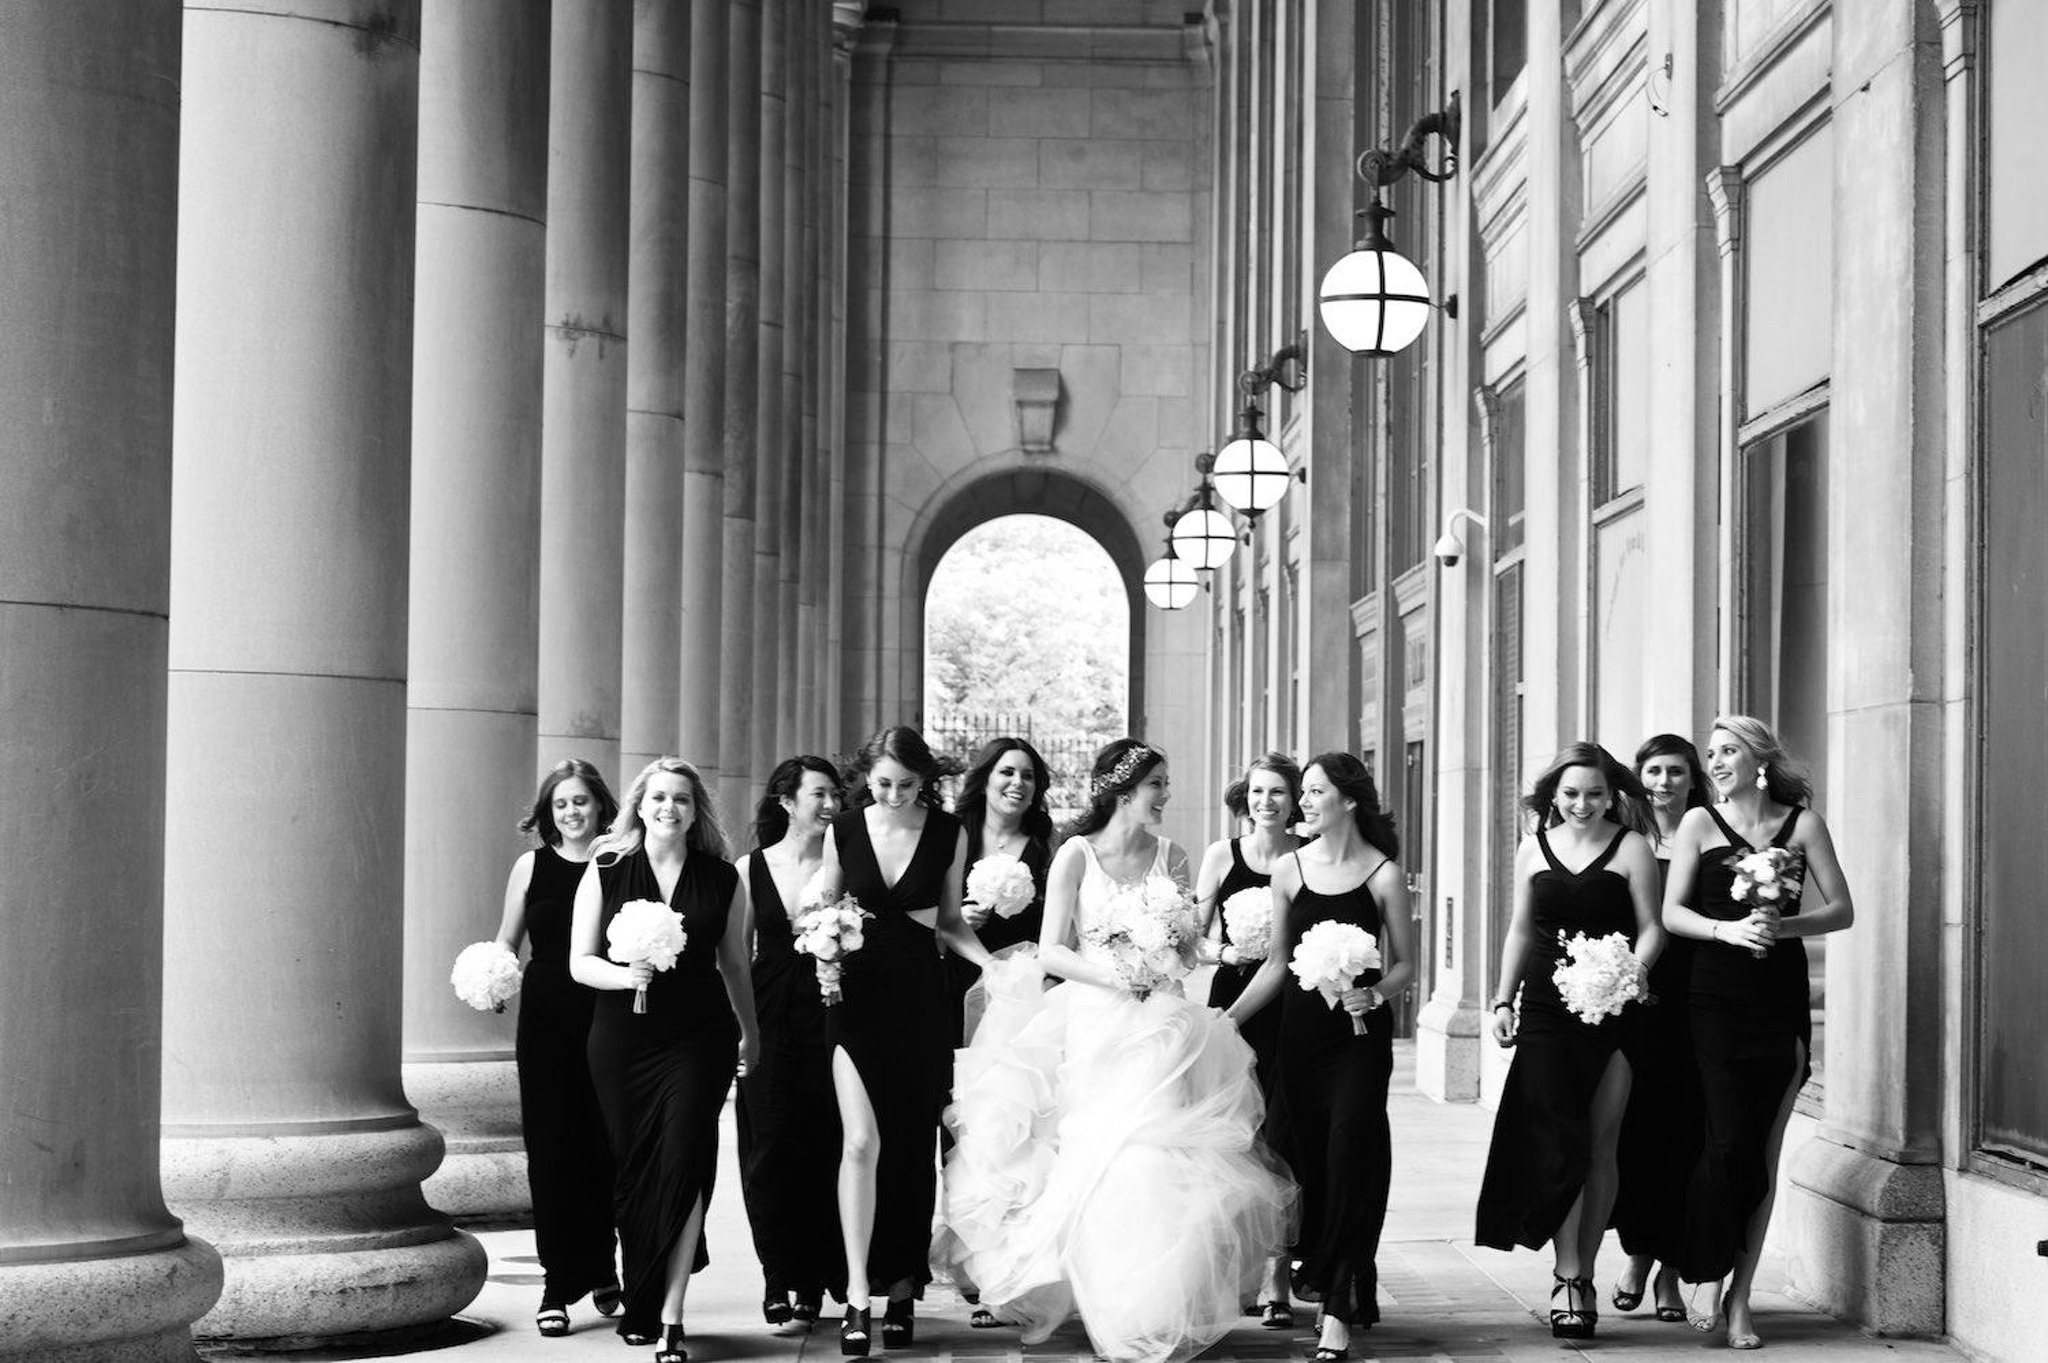 Chicago Wedding Photographer - STUDIO THIS IS